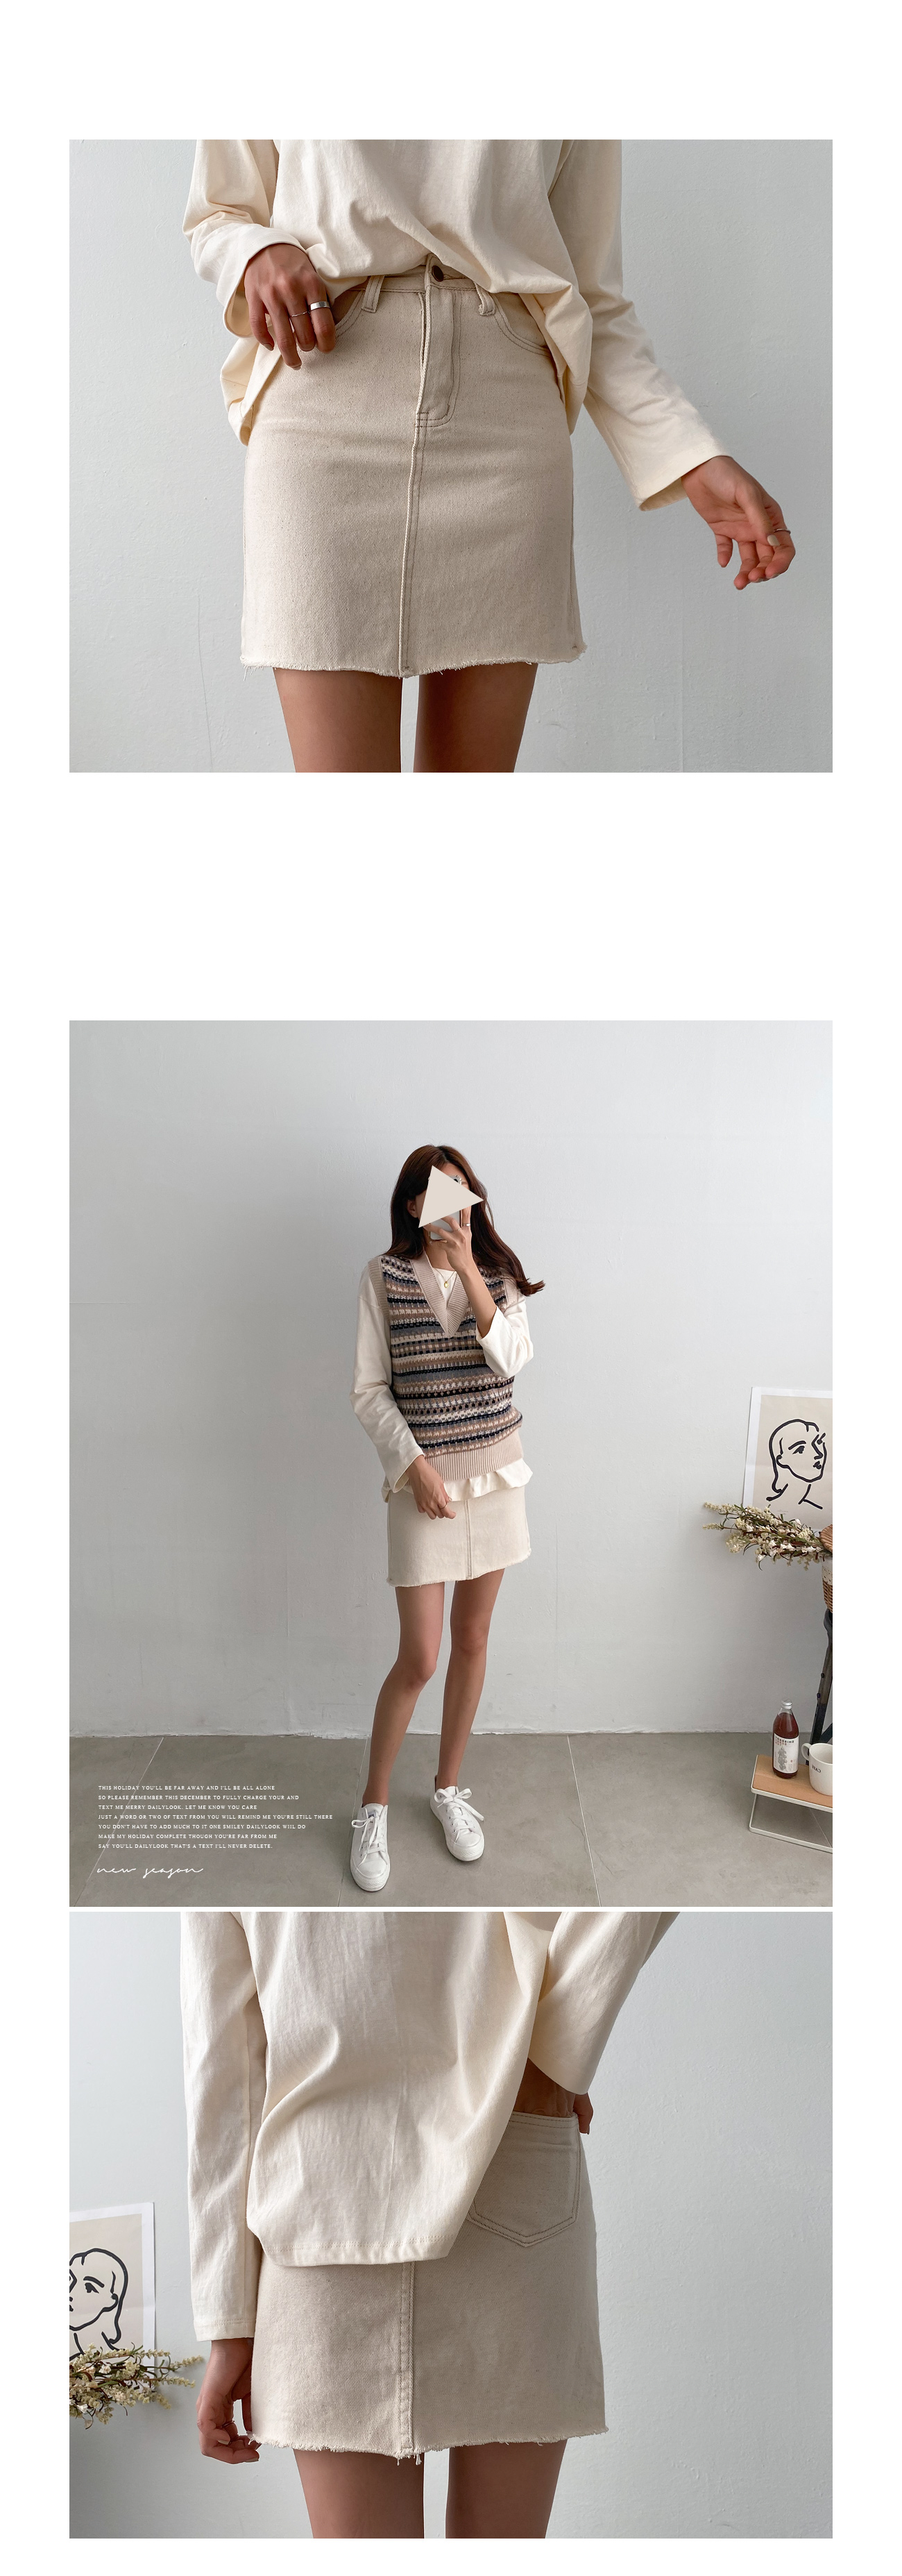 Casual A-line minimalist skirt #51273